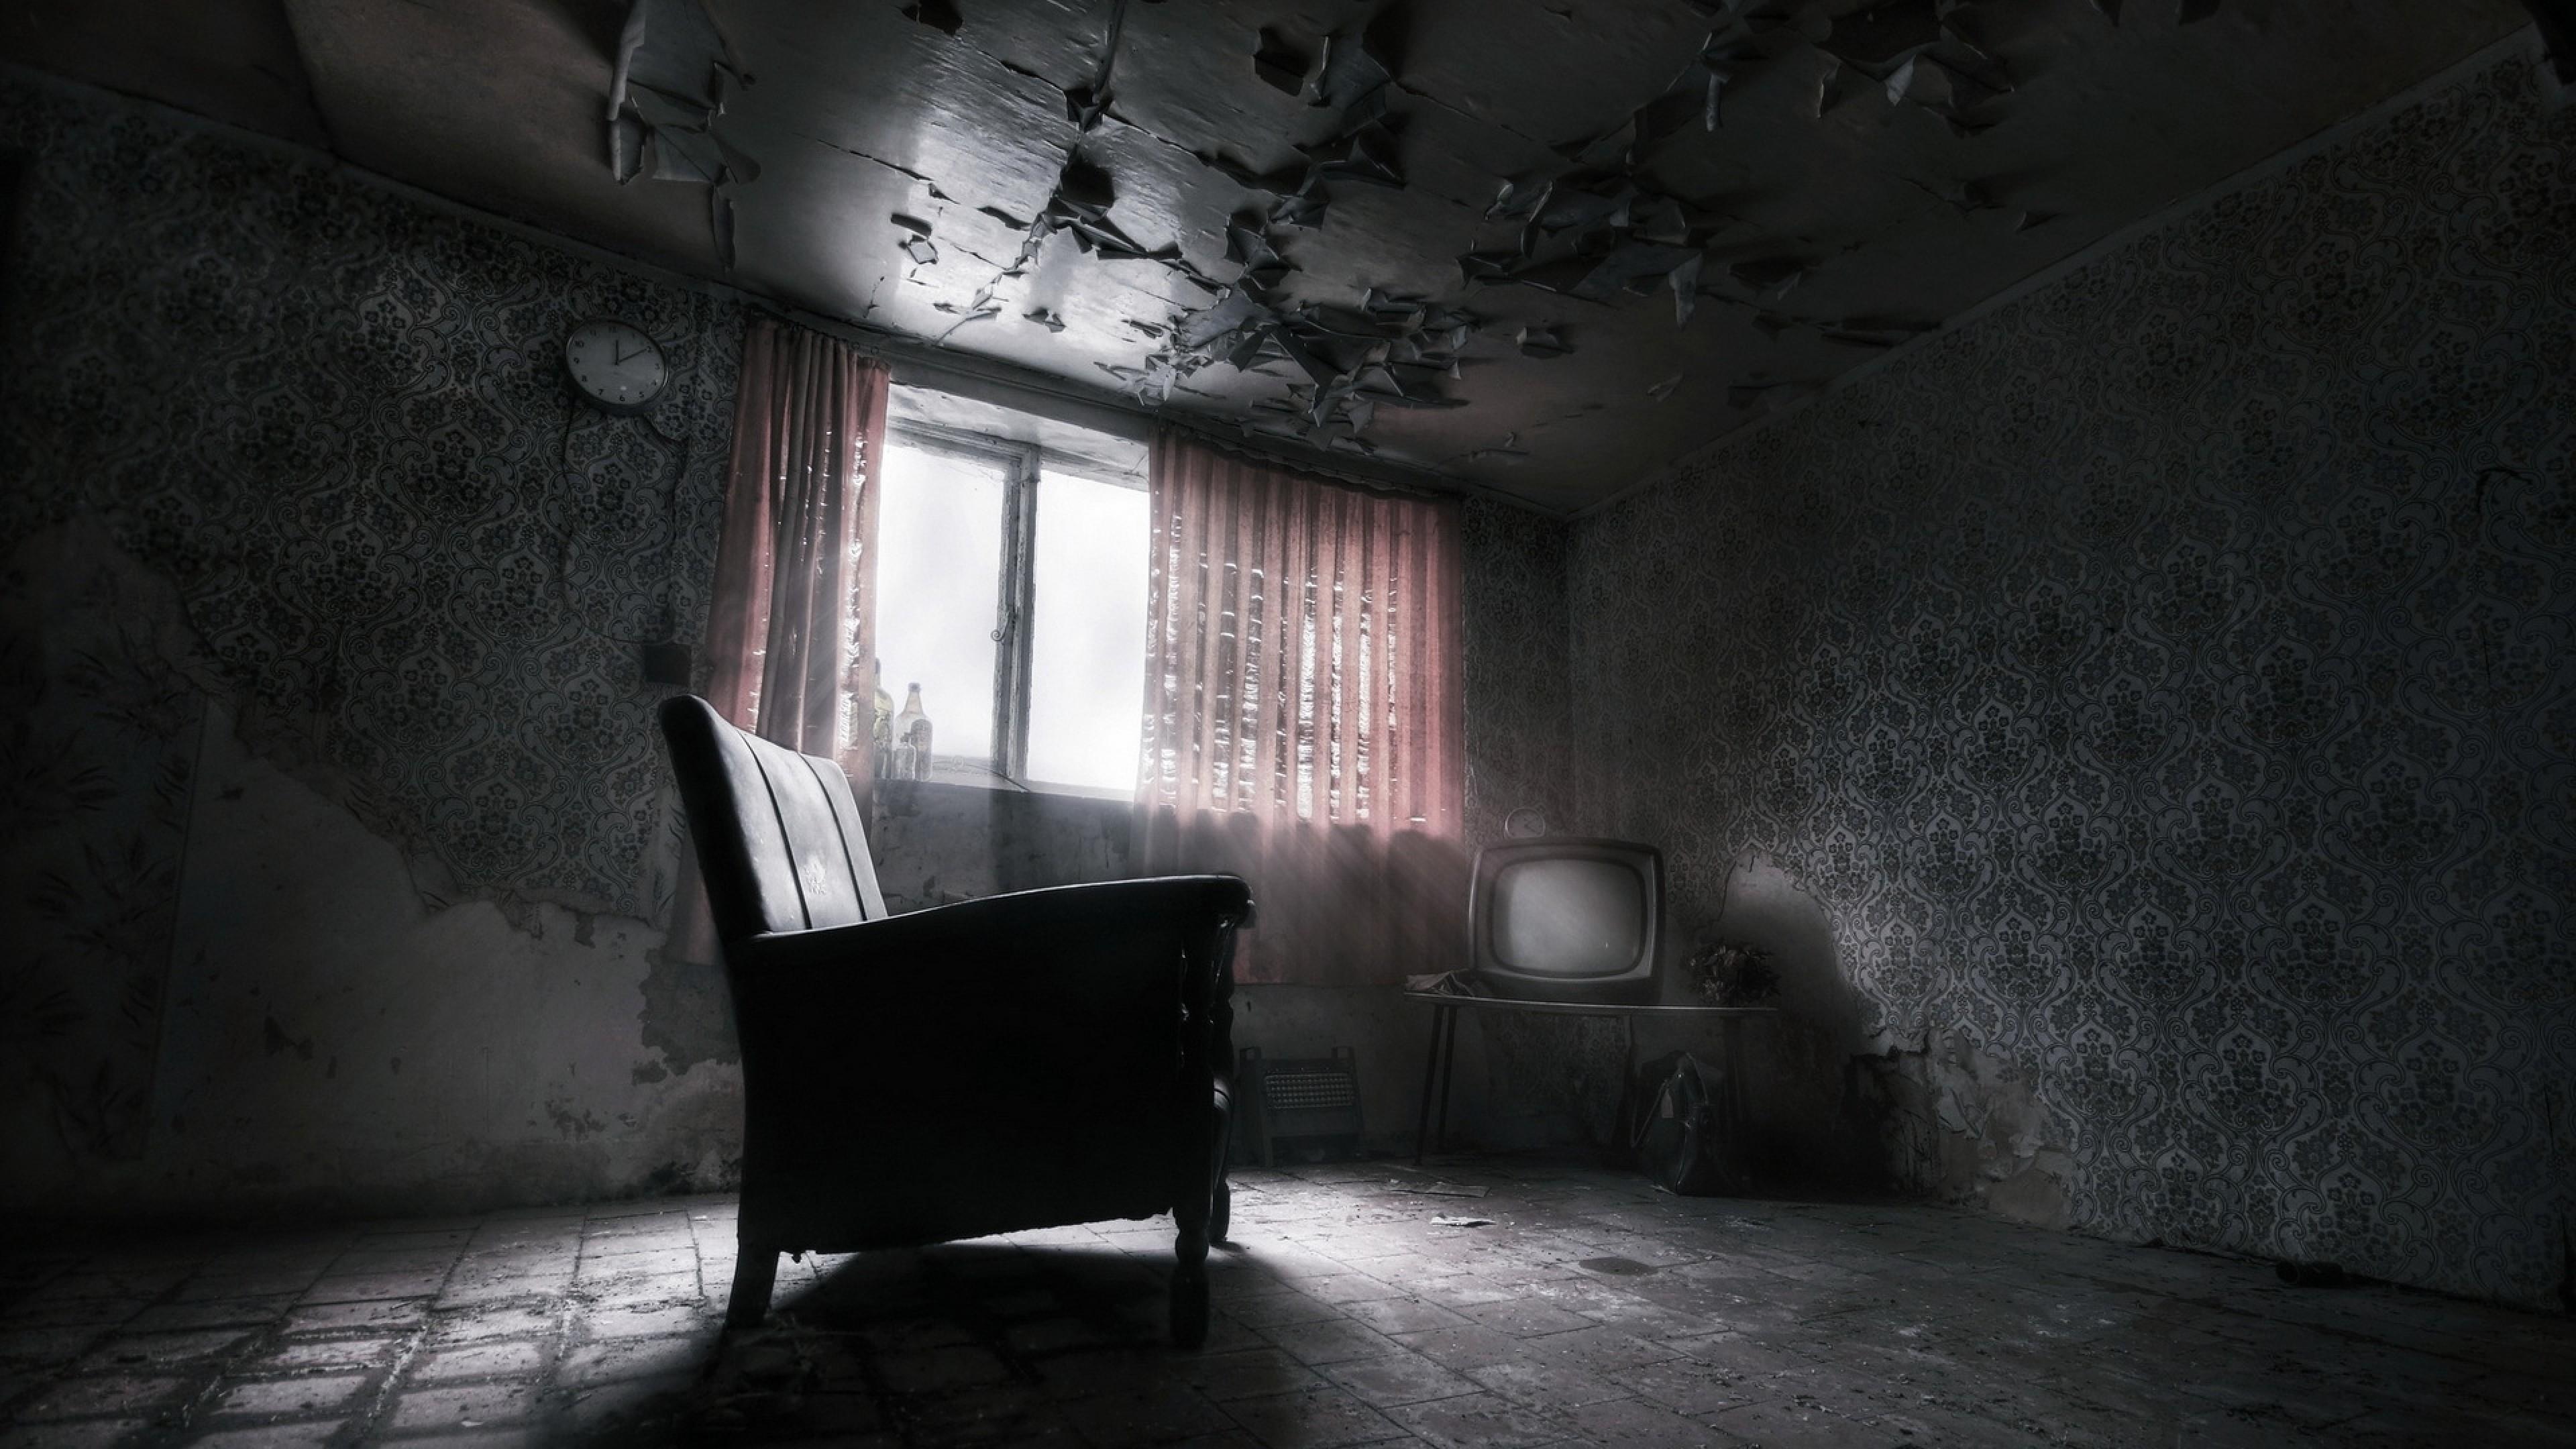 Abandoned Dark Room Wallpaper | Wallpaper Studio 10 | Tens of ...